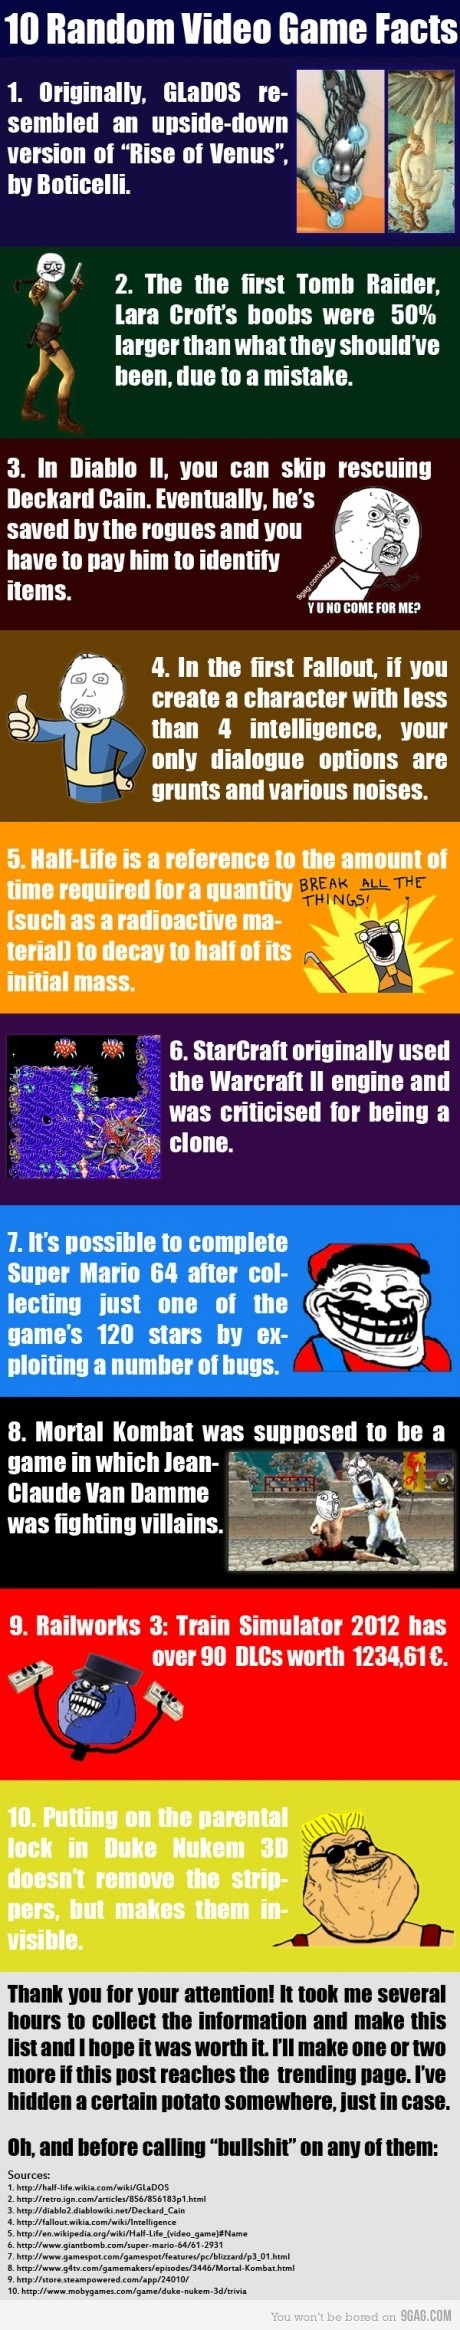 10 True random video game facts